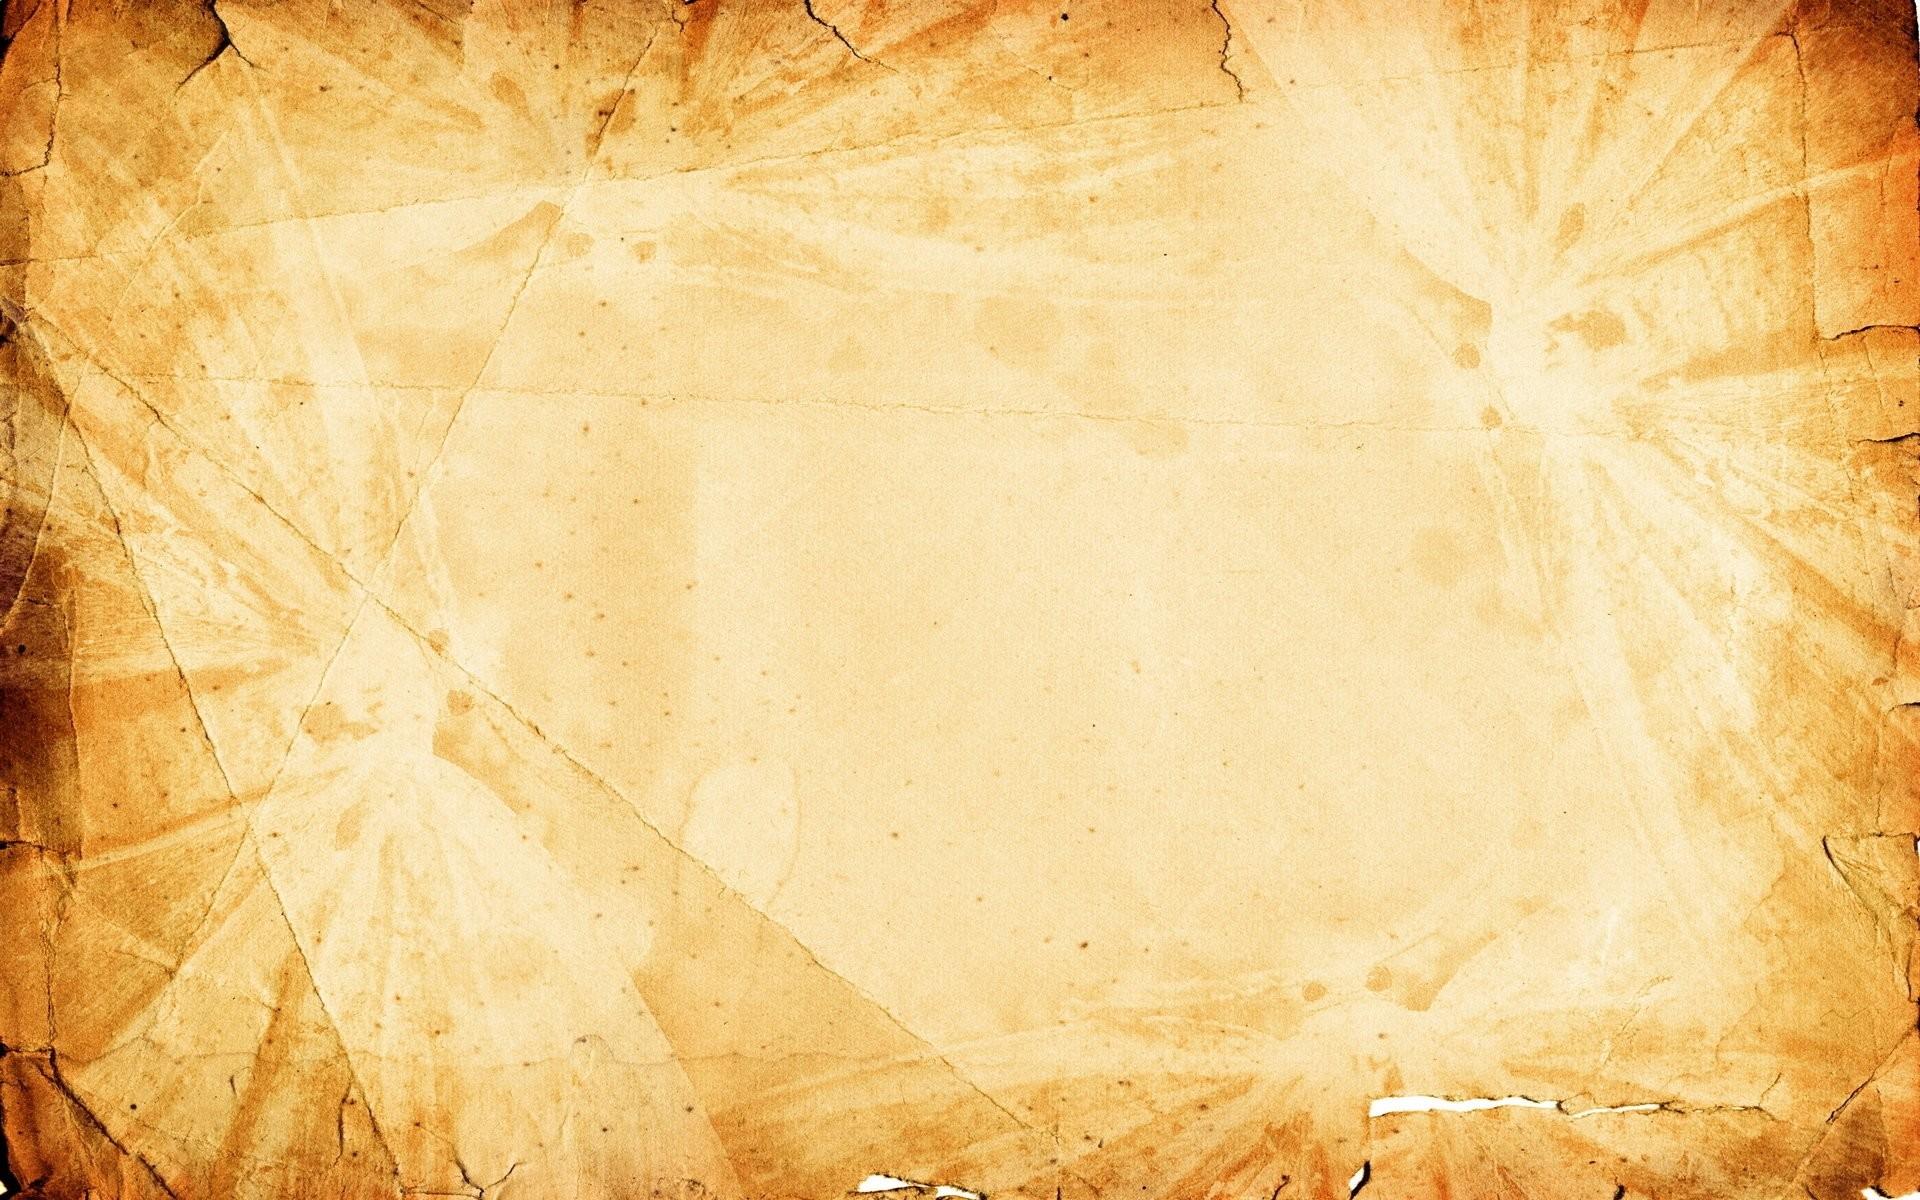 1920x1920 Antique Artwork Arty Grunge Vintage Wallpaper Paper Decor Day Corn Art Cardboard Red Summer Material Sky